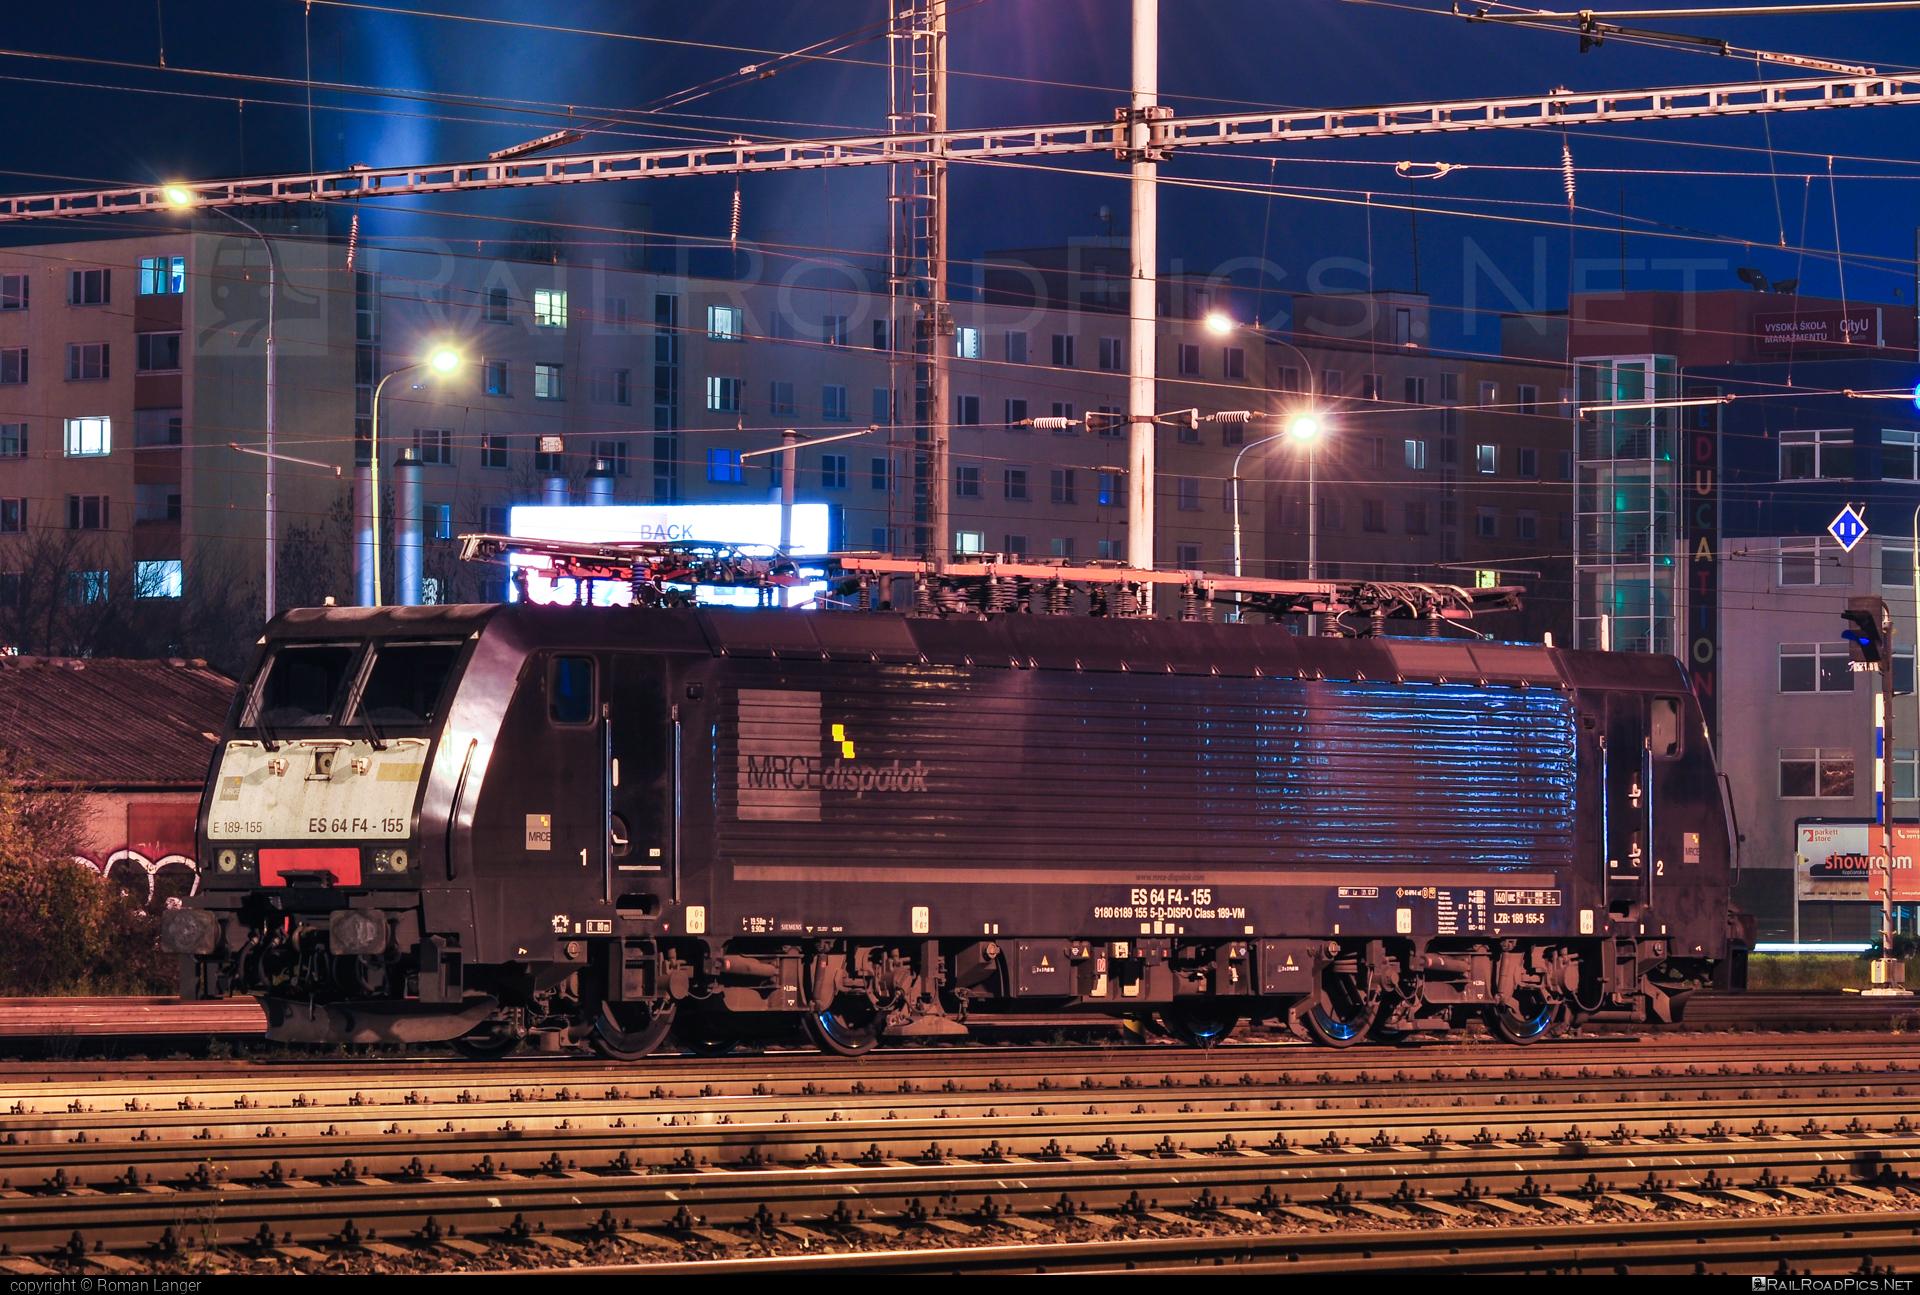 Siemens ES 64 F4 - 189 155-5 operated by Retrack Slovakia s. r. o. #dispolok #es64 #es64f4 #eurosprinter #mitsuirailcapitaleurope #mitsuirailcapitaleuropegmbh #mrce #retrack #retrackslovakia #siemens #siemenses64 #siemenses64f4